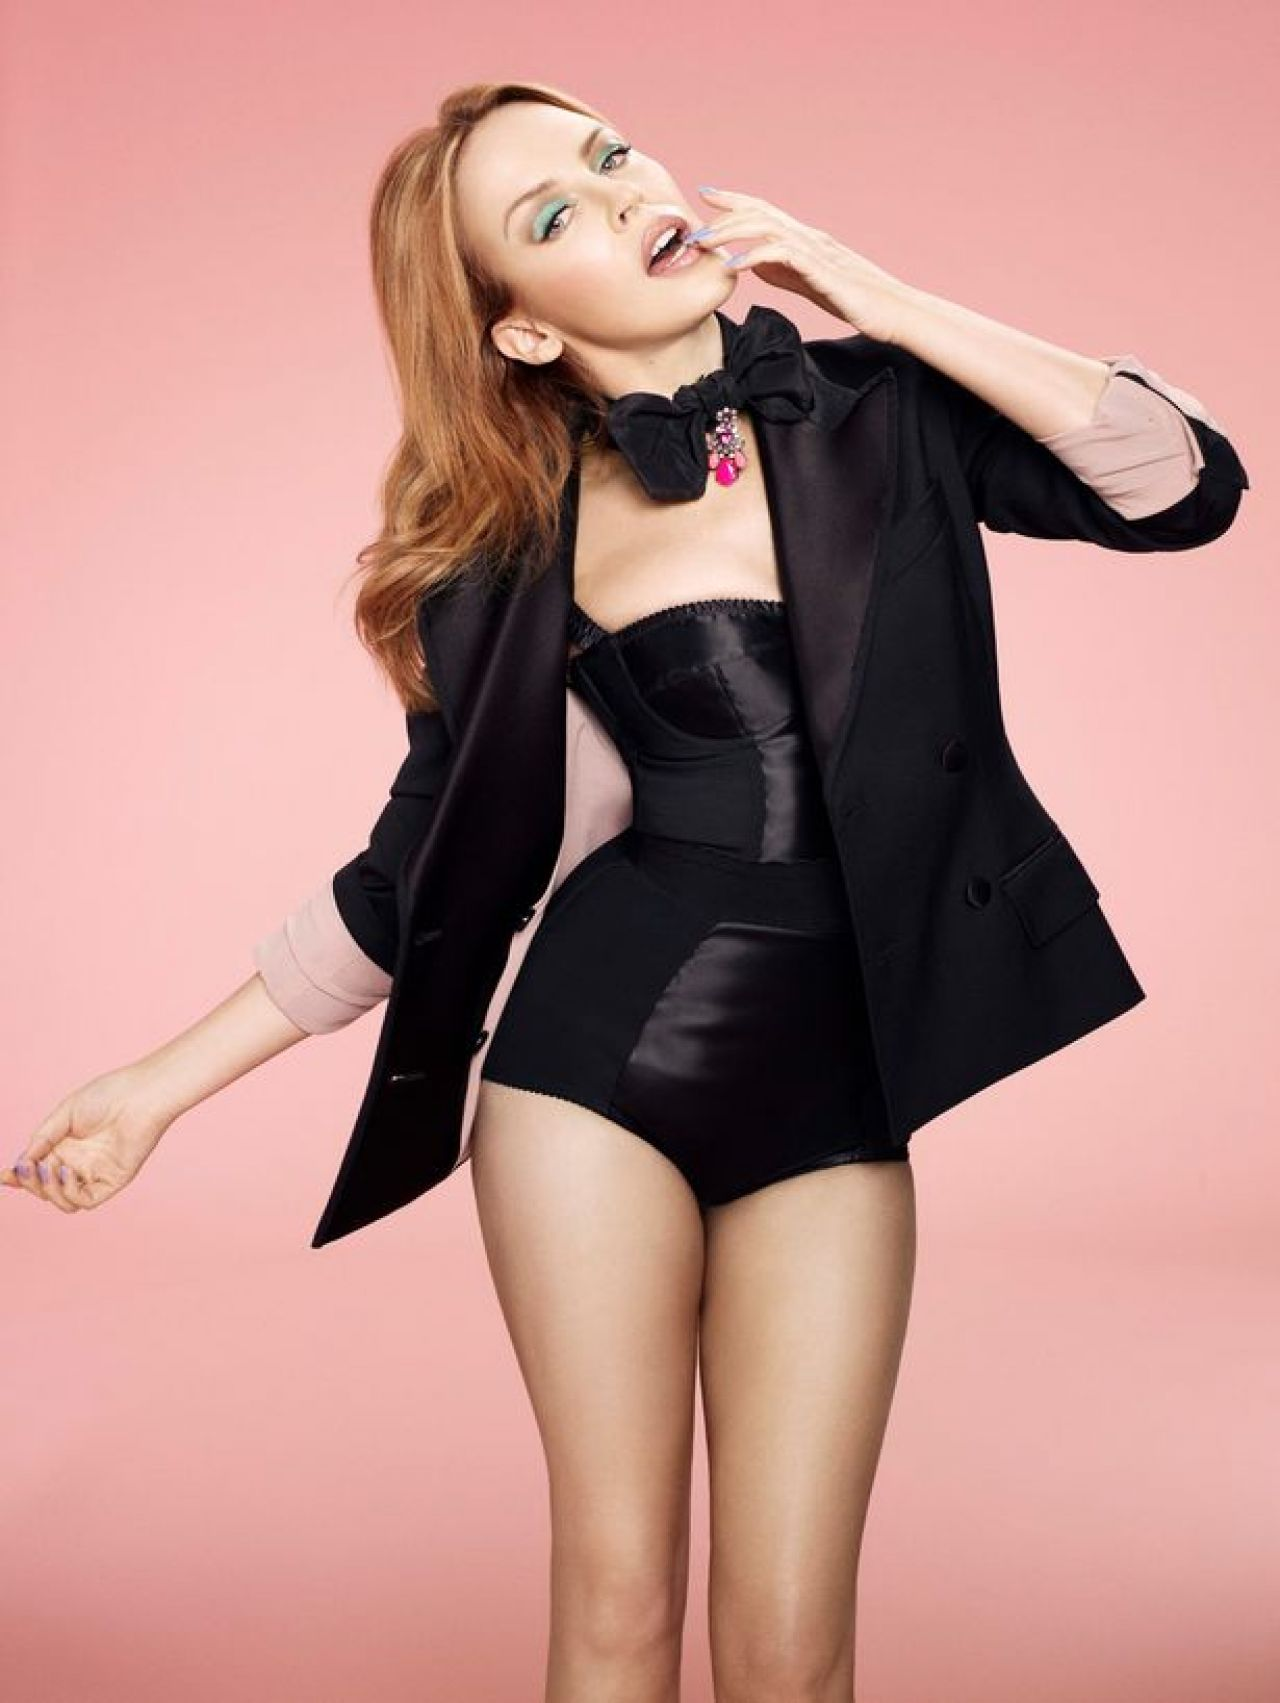 Cheryl Cole - 2014 Calendar Photoshoot